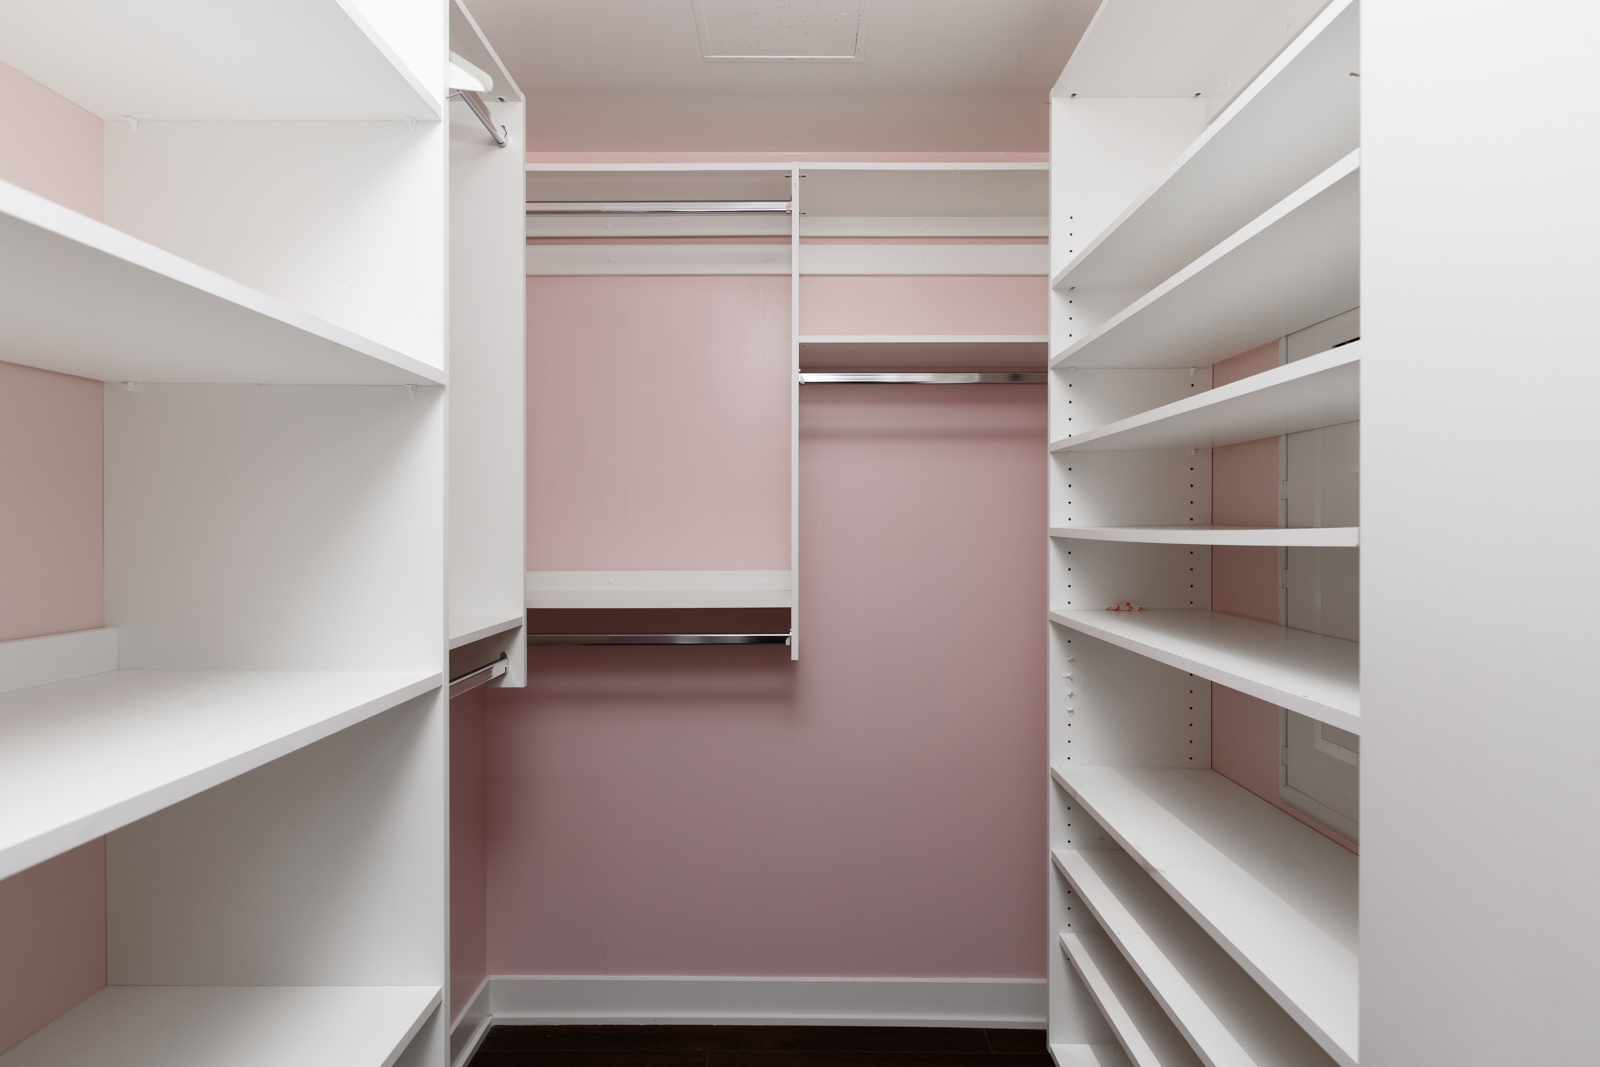 Organized closet in Kits360 condo managed by Birds Nest Properties